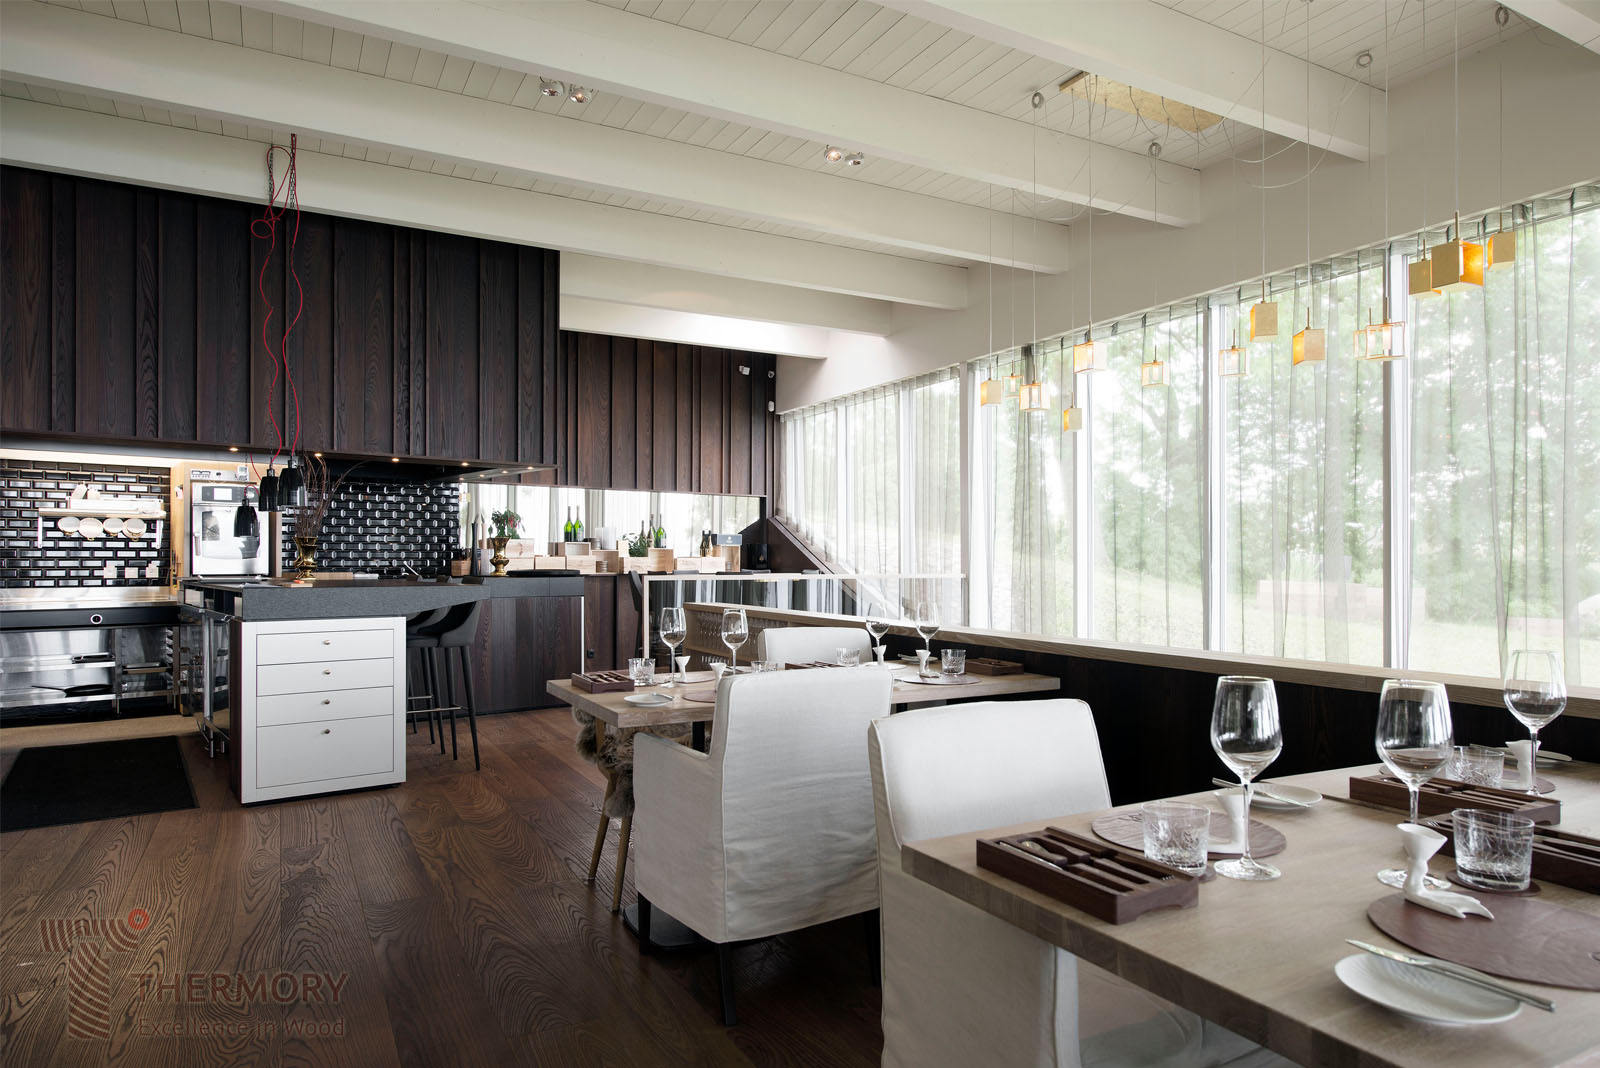 Thermory Ash Flooring, Paneling_Restaurant Noa, Estonia.jpg